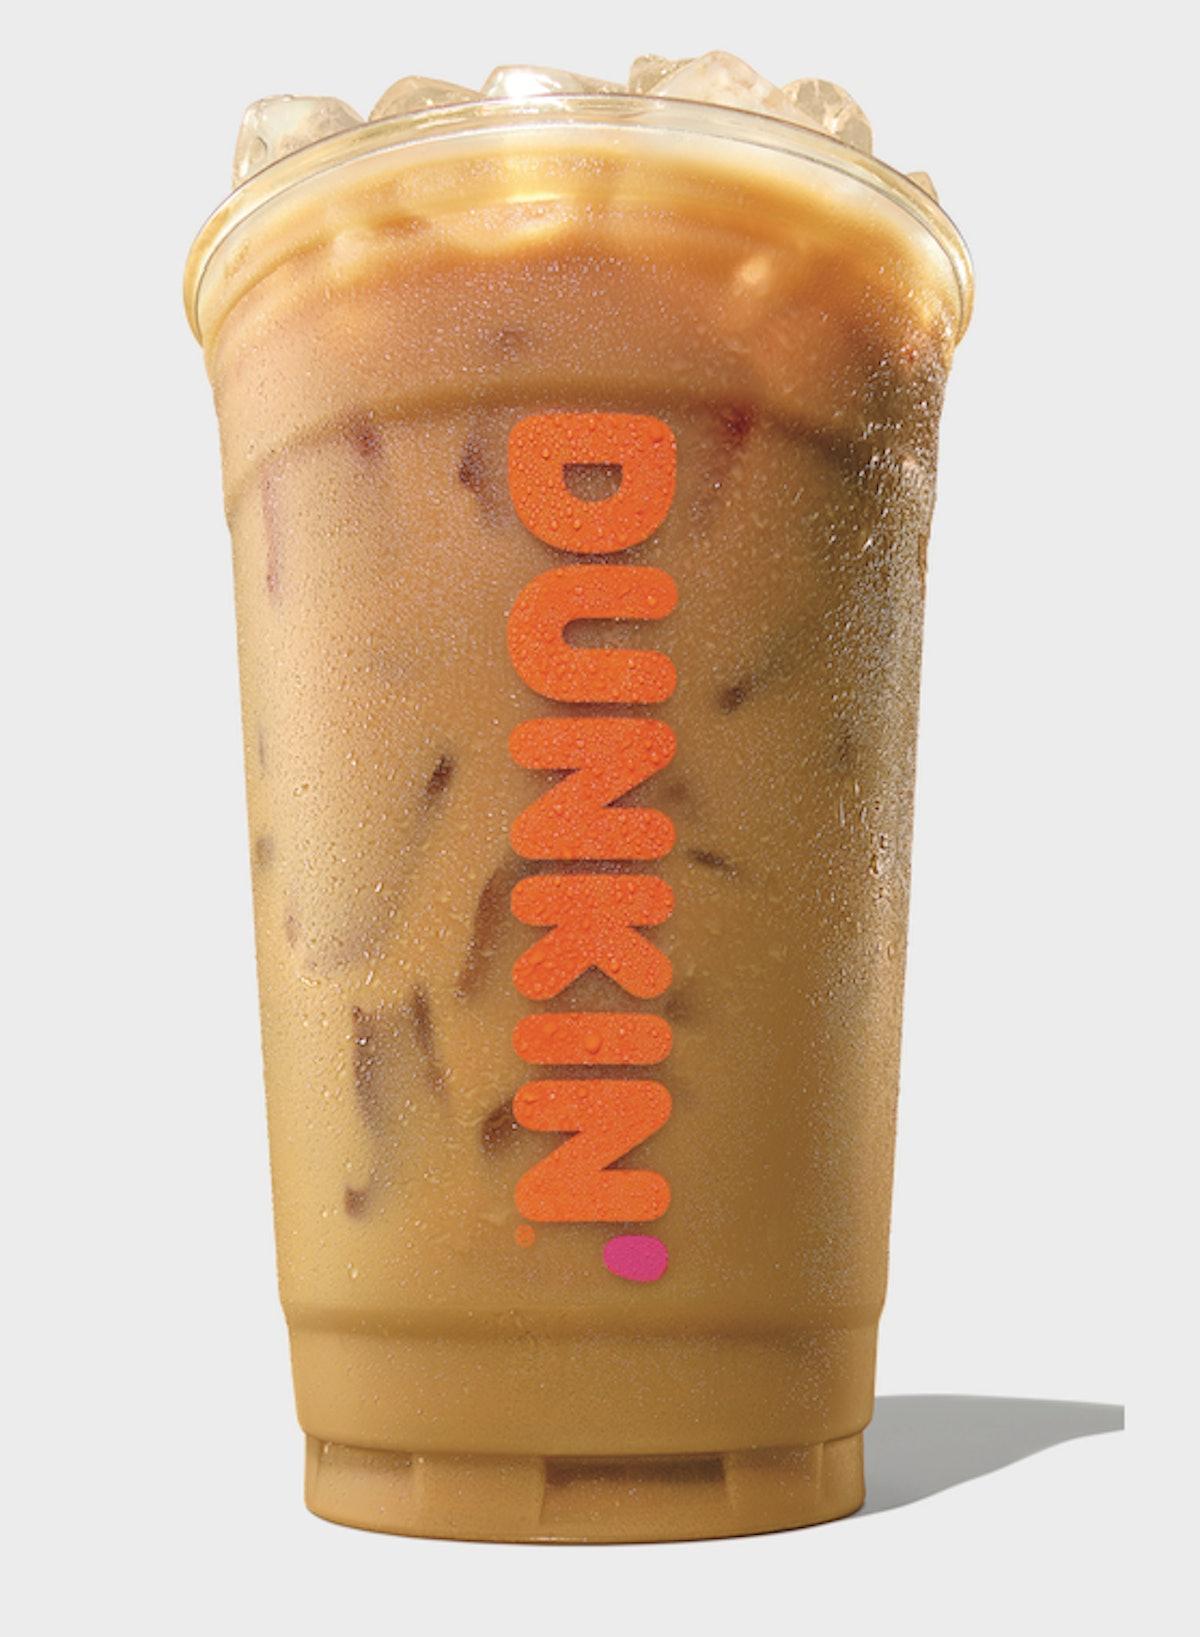 Dunkin's Irish Creme Coffee is back for 2020.